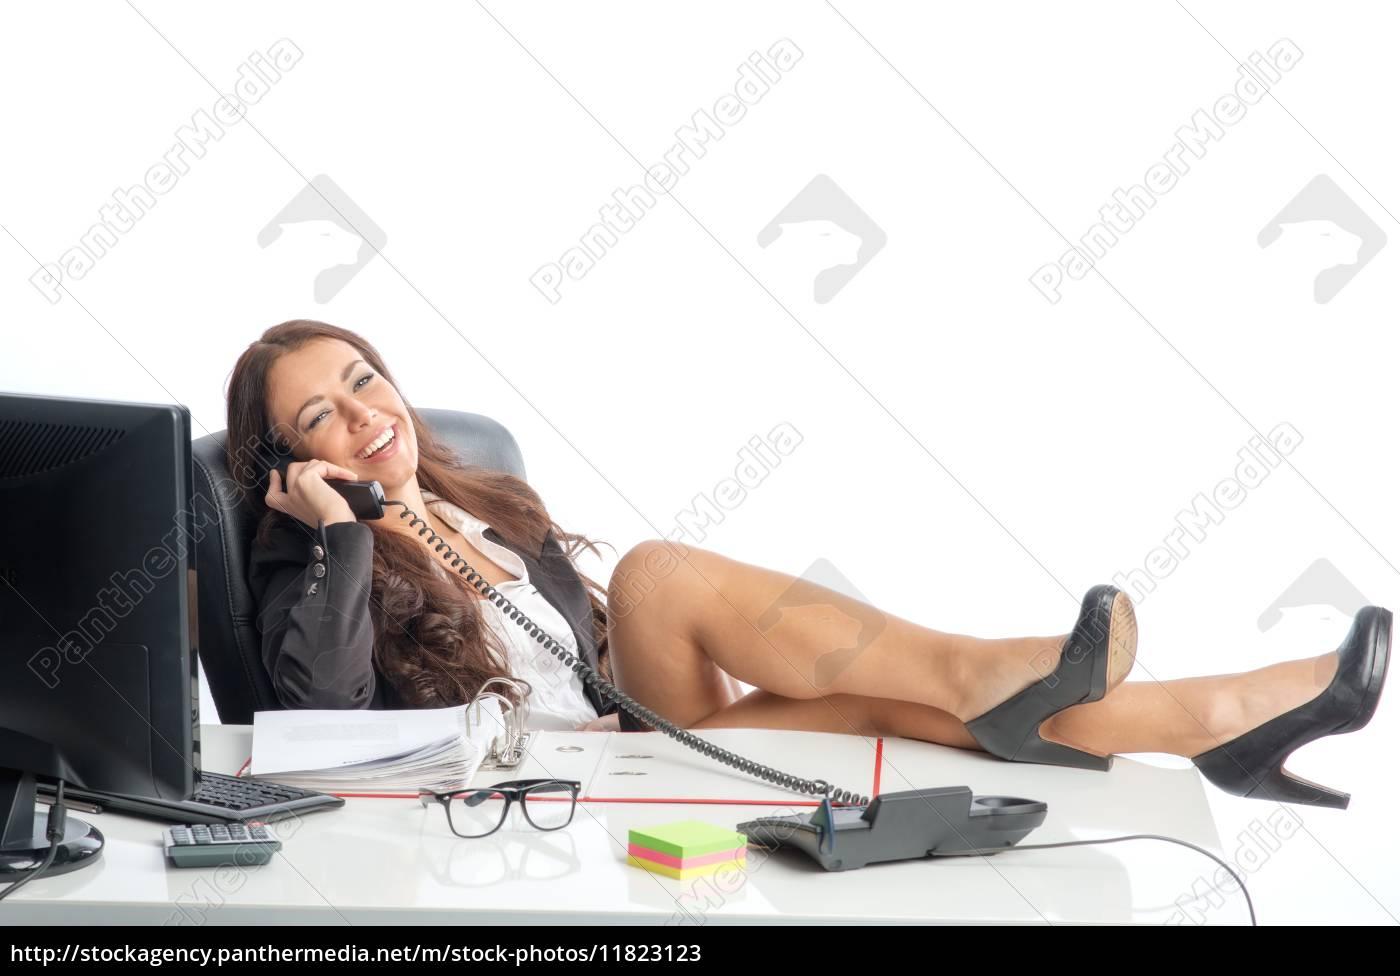 privatgespräch, im, büro - 11823123